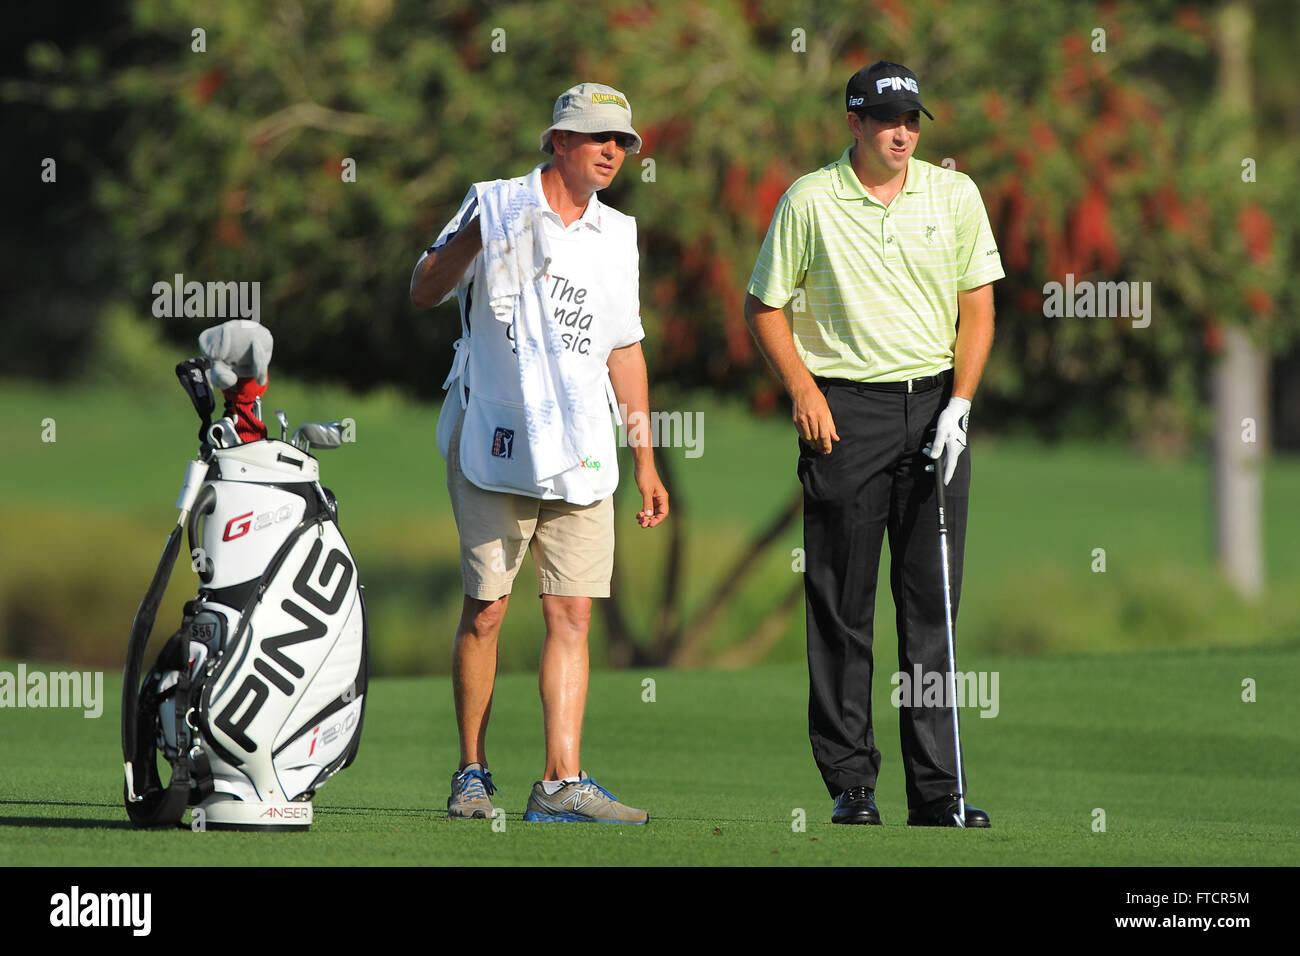 Palm Beach Gardens, Fla, USA. 2nd Mar, 2012. Michael Thompson and ...